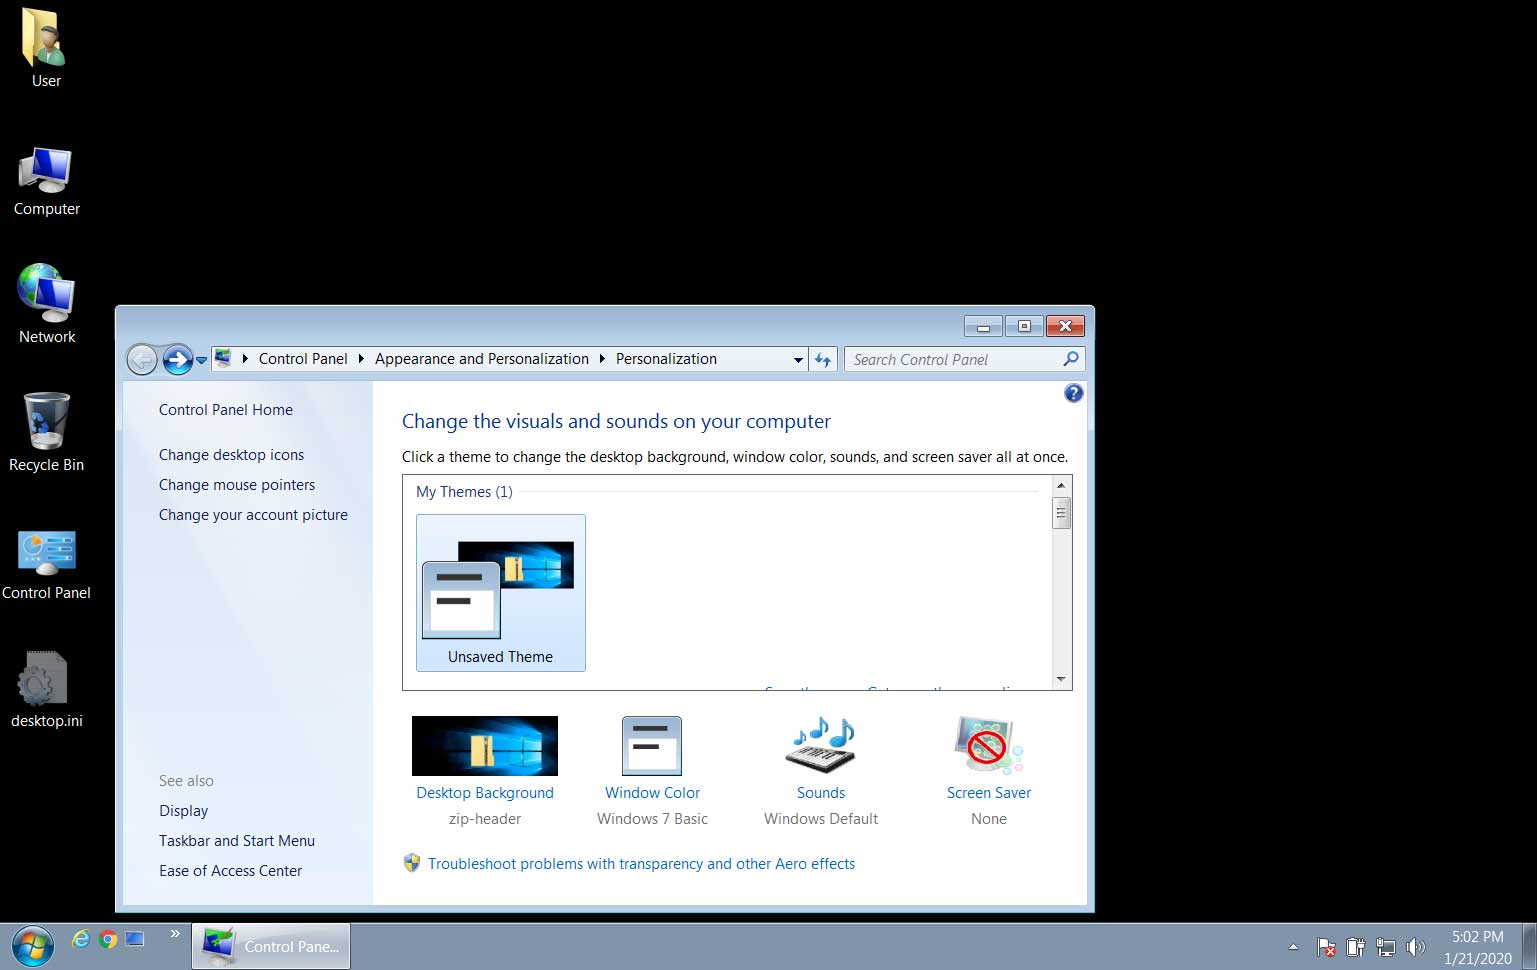 Microsoft Releases Windows 7 Update To Fix Wallpaper Bug